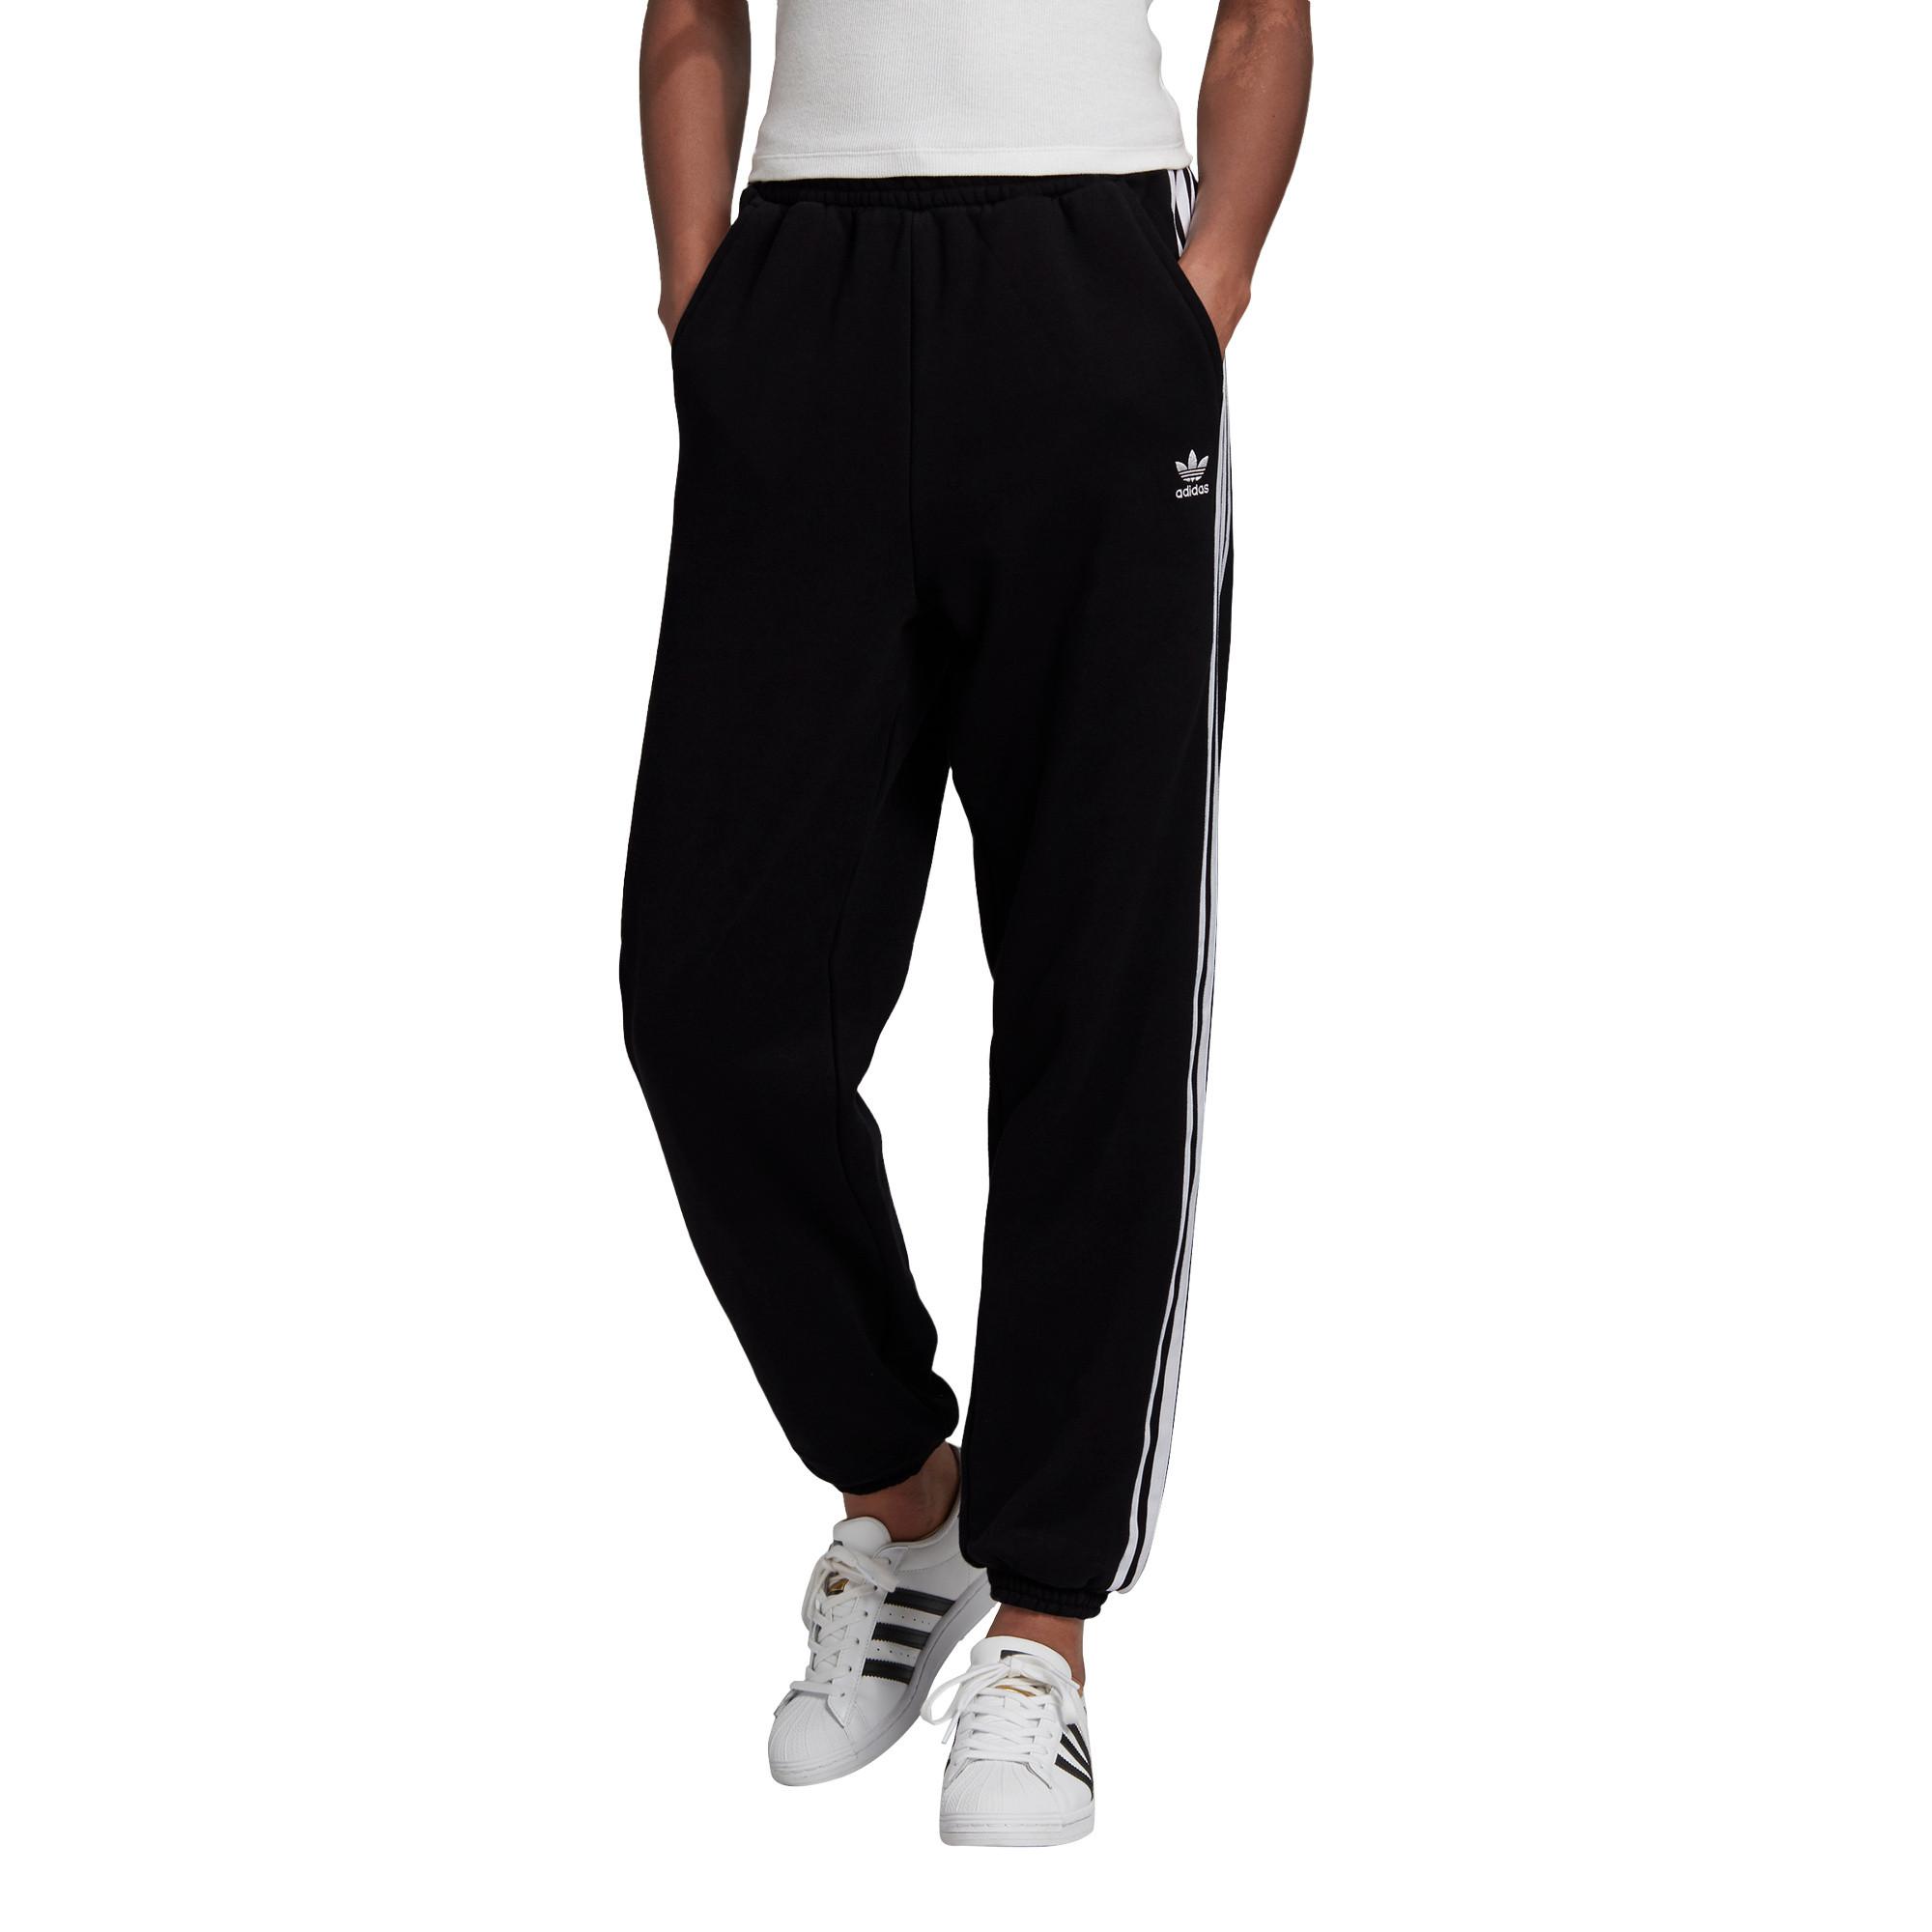 Pantaloni tuta Regular Jogger, Nero, large image number 5